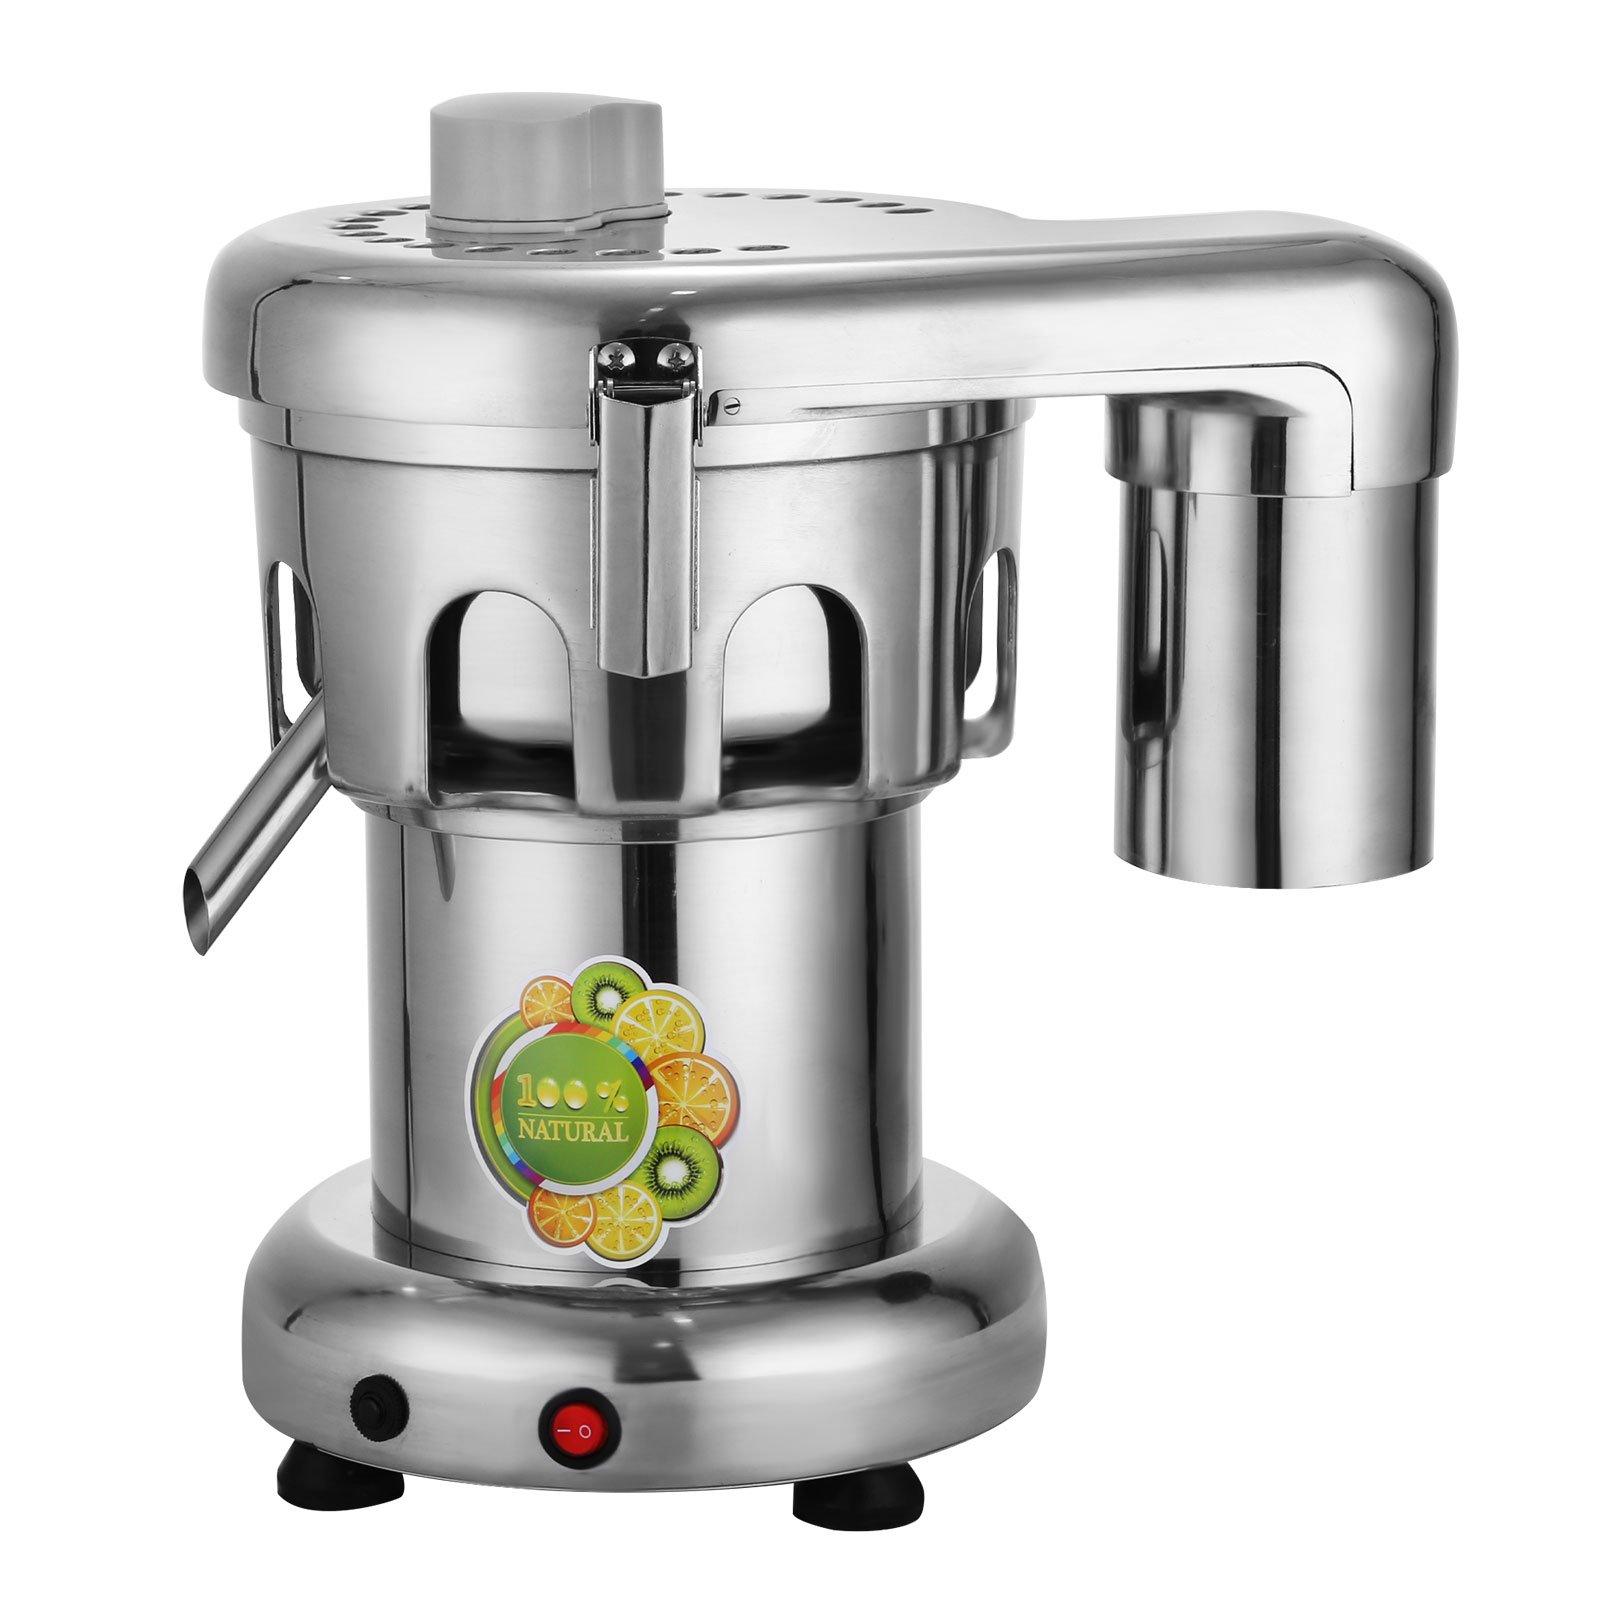 OrangeA 370W Commercial Juice Extractor Heavy Duty